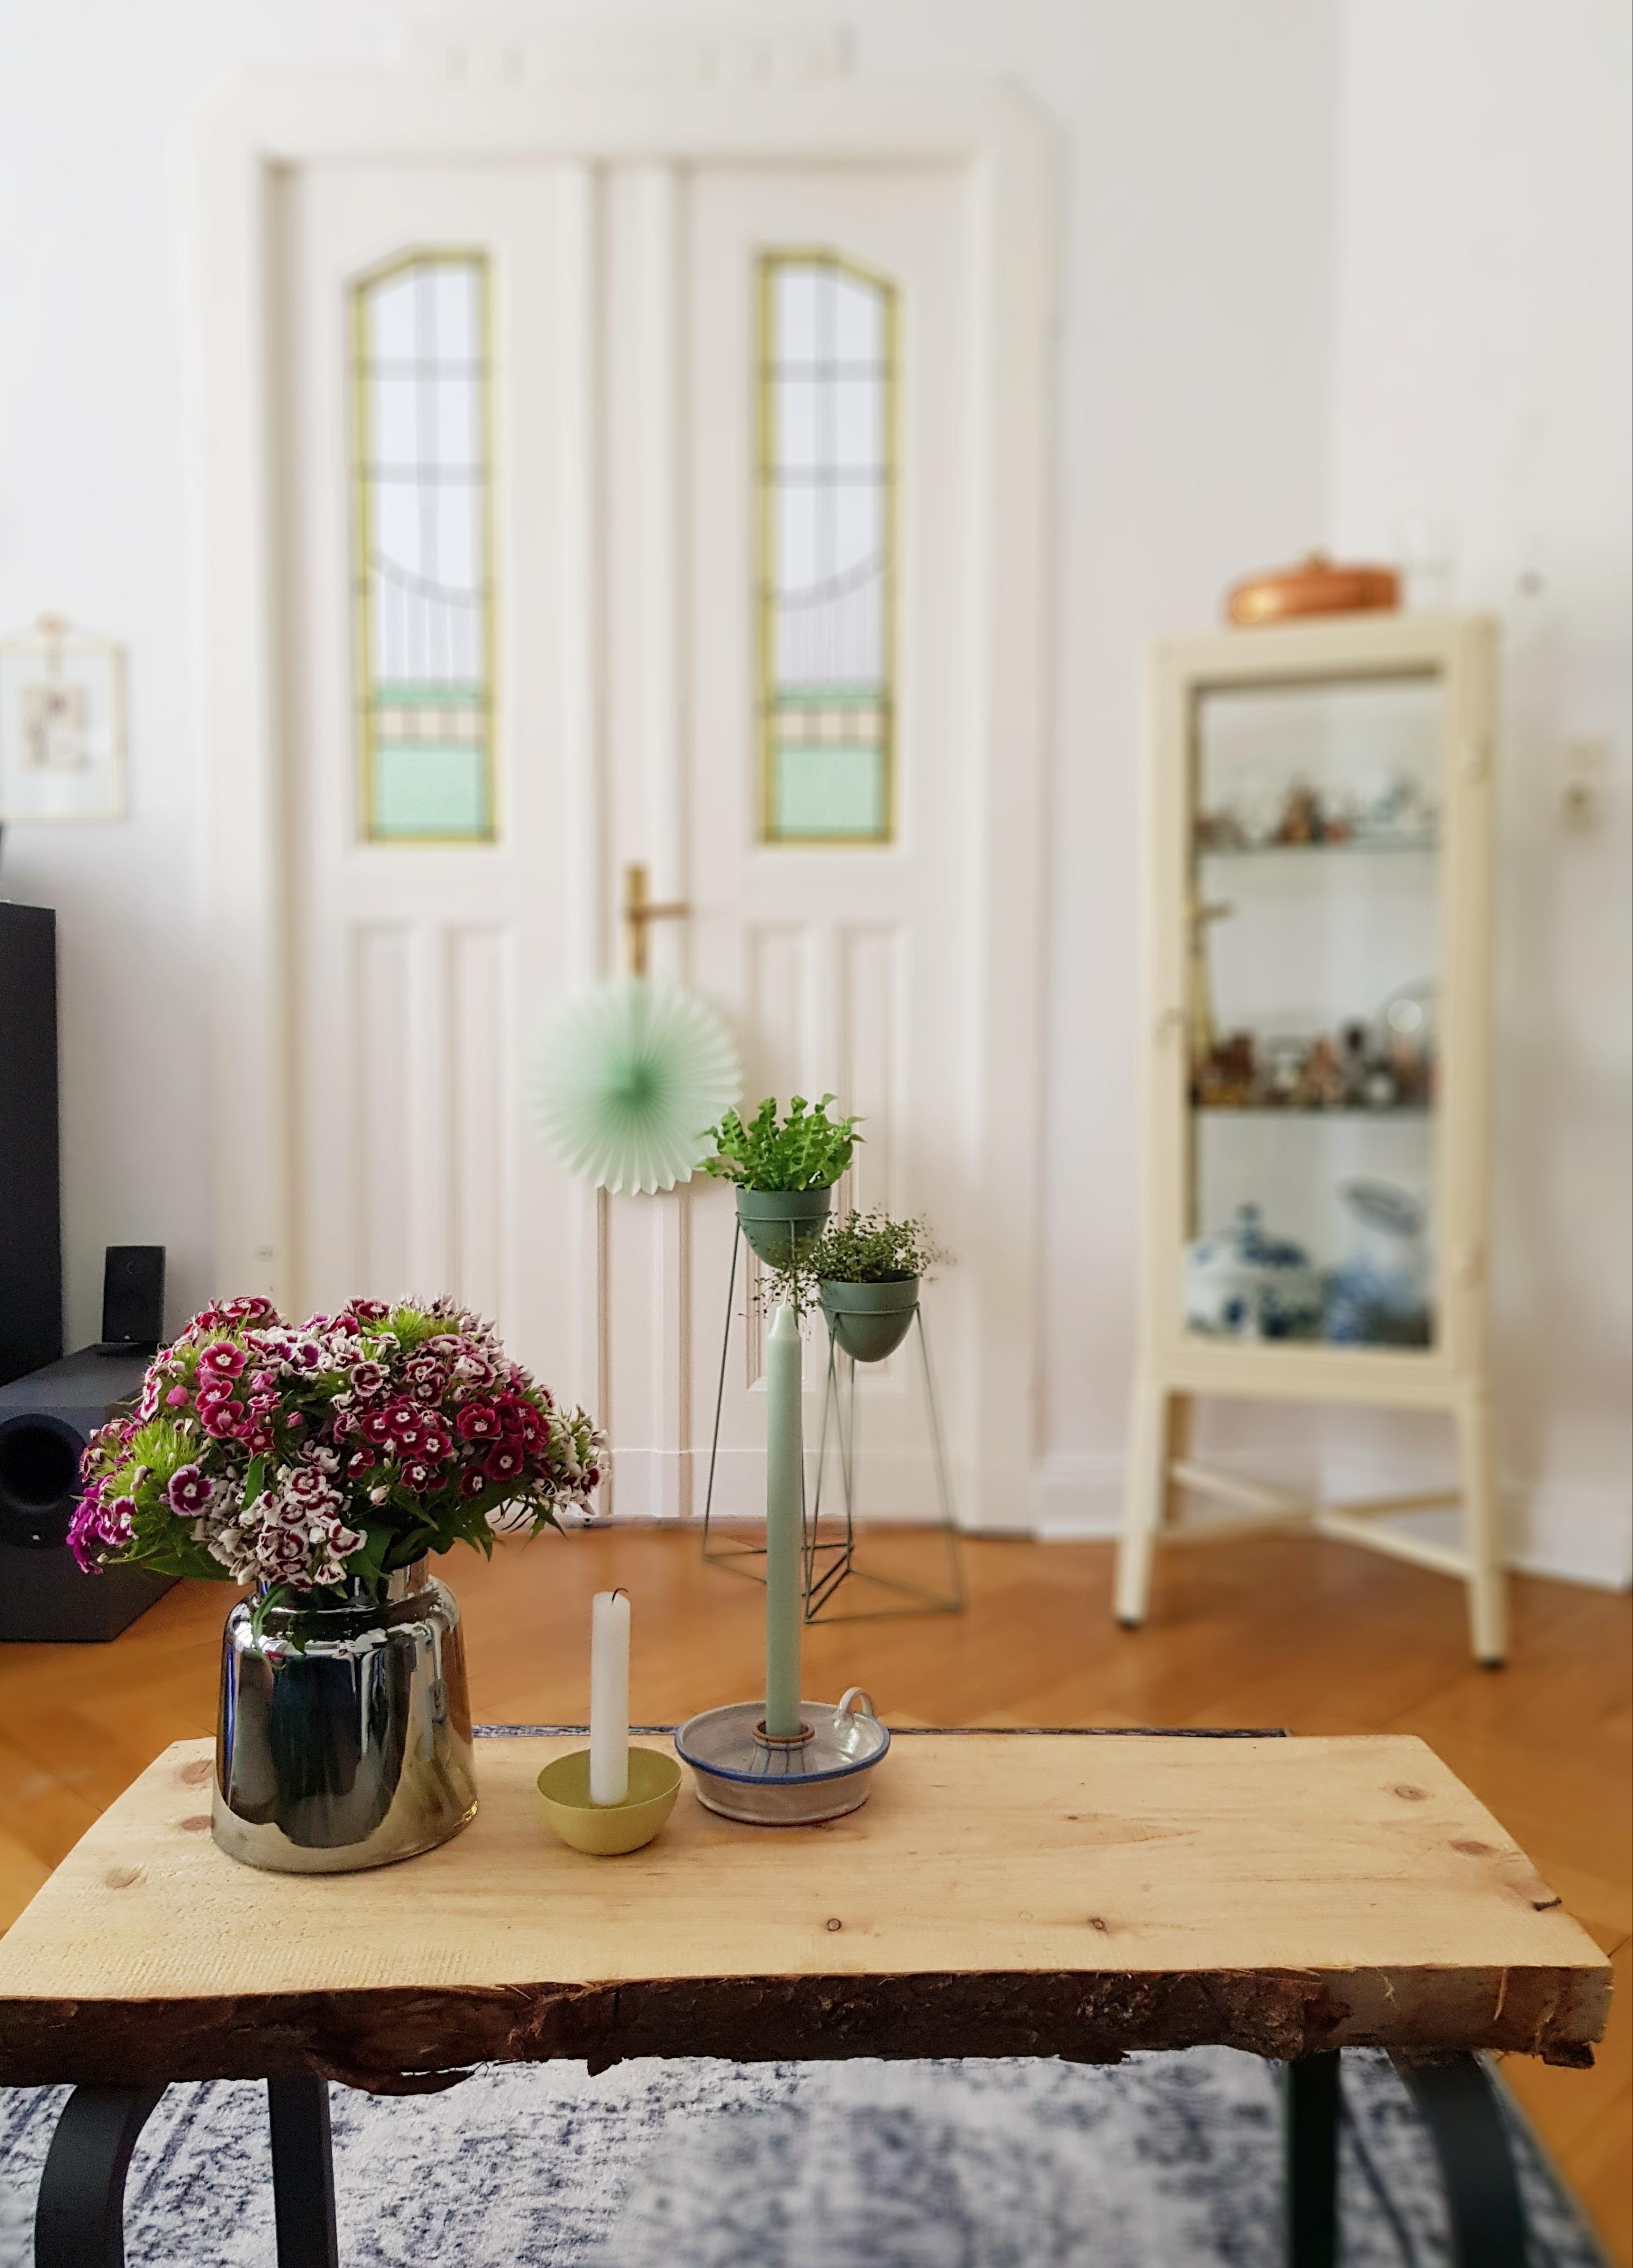 Blumen Bartnelken Gehoeren Zum Sommer Und Schmuecken Unseren Diy Tisch  E78cba53 Dec7 405b 830b 8105d9ce543e